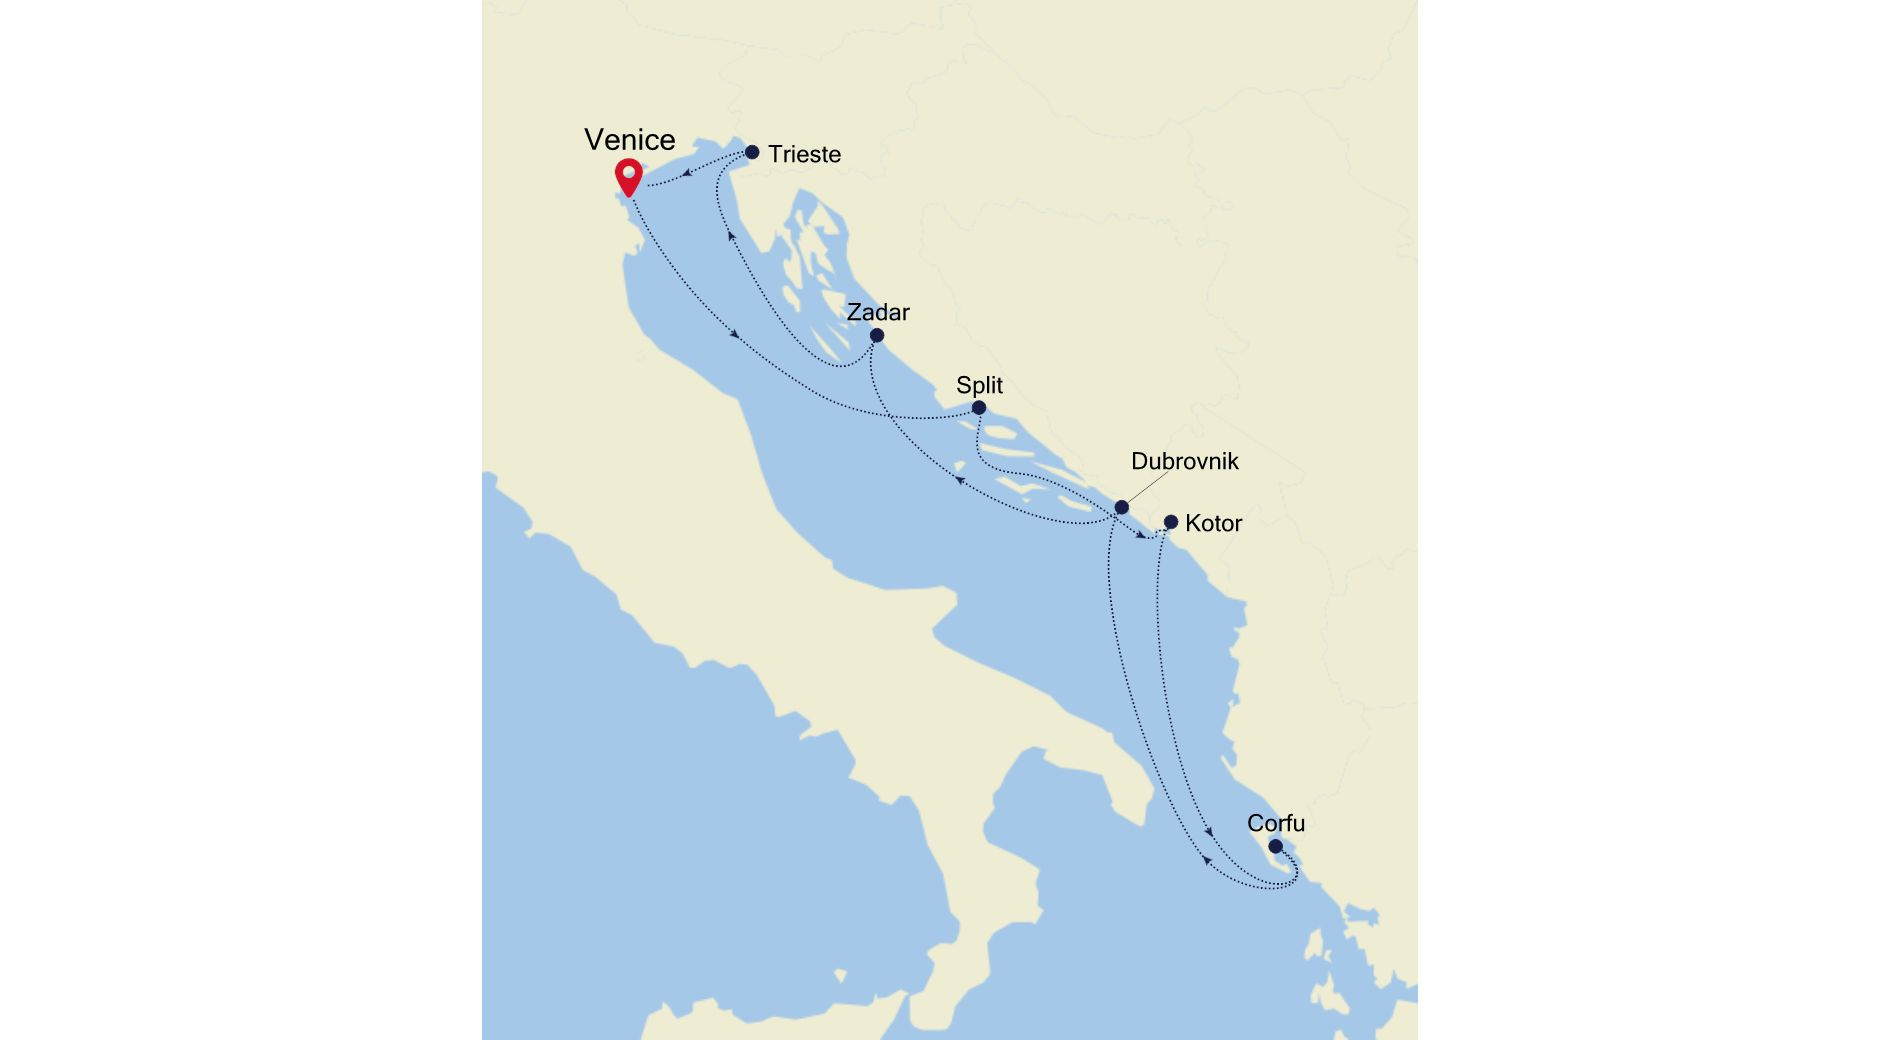 MO210902007 - Venice to Venice